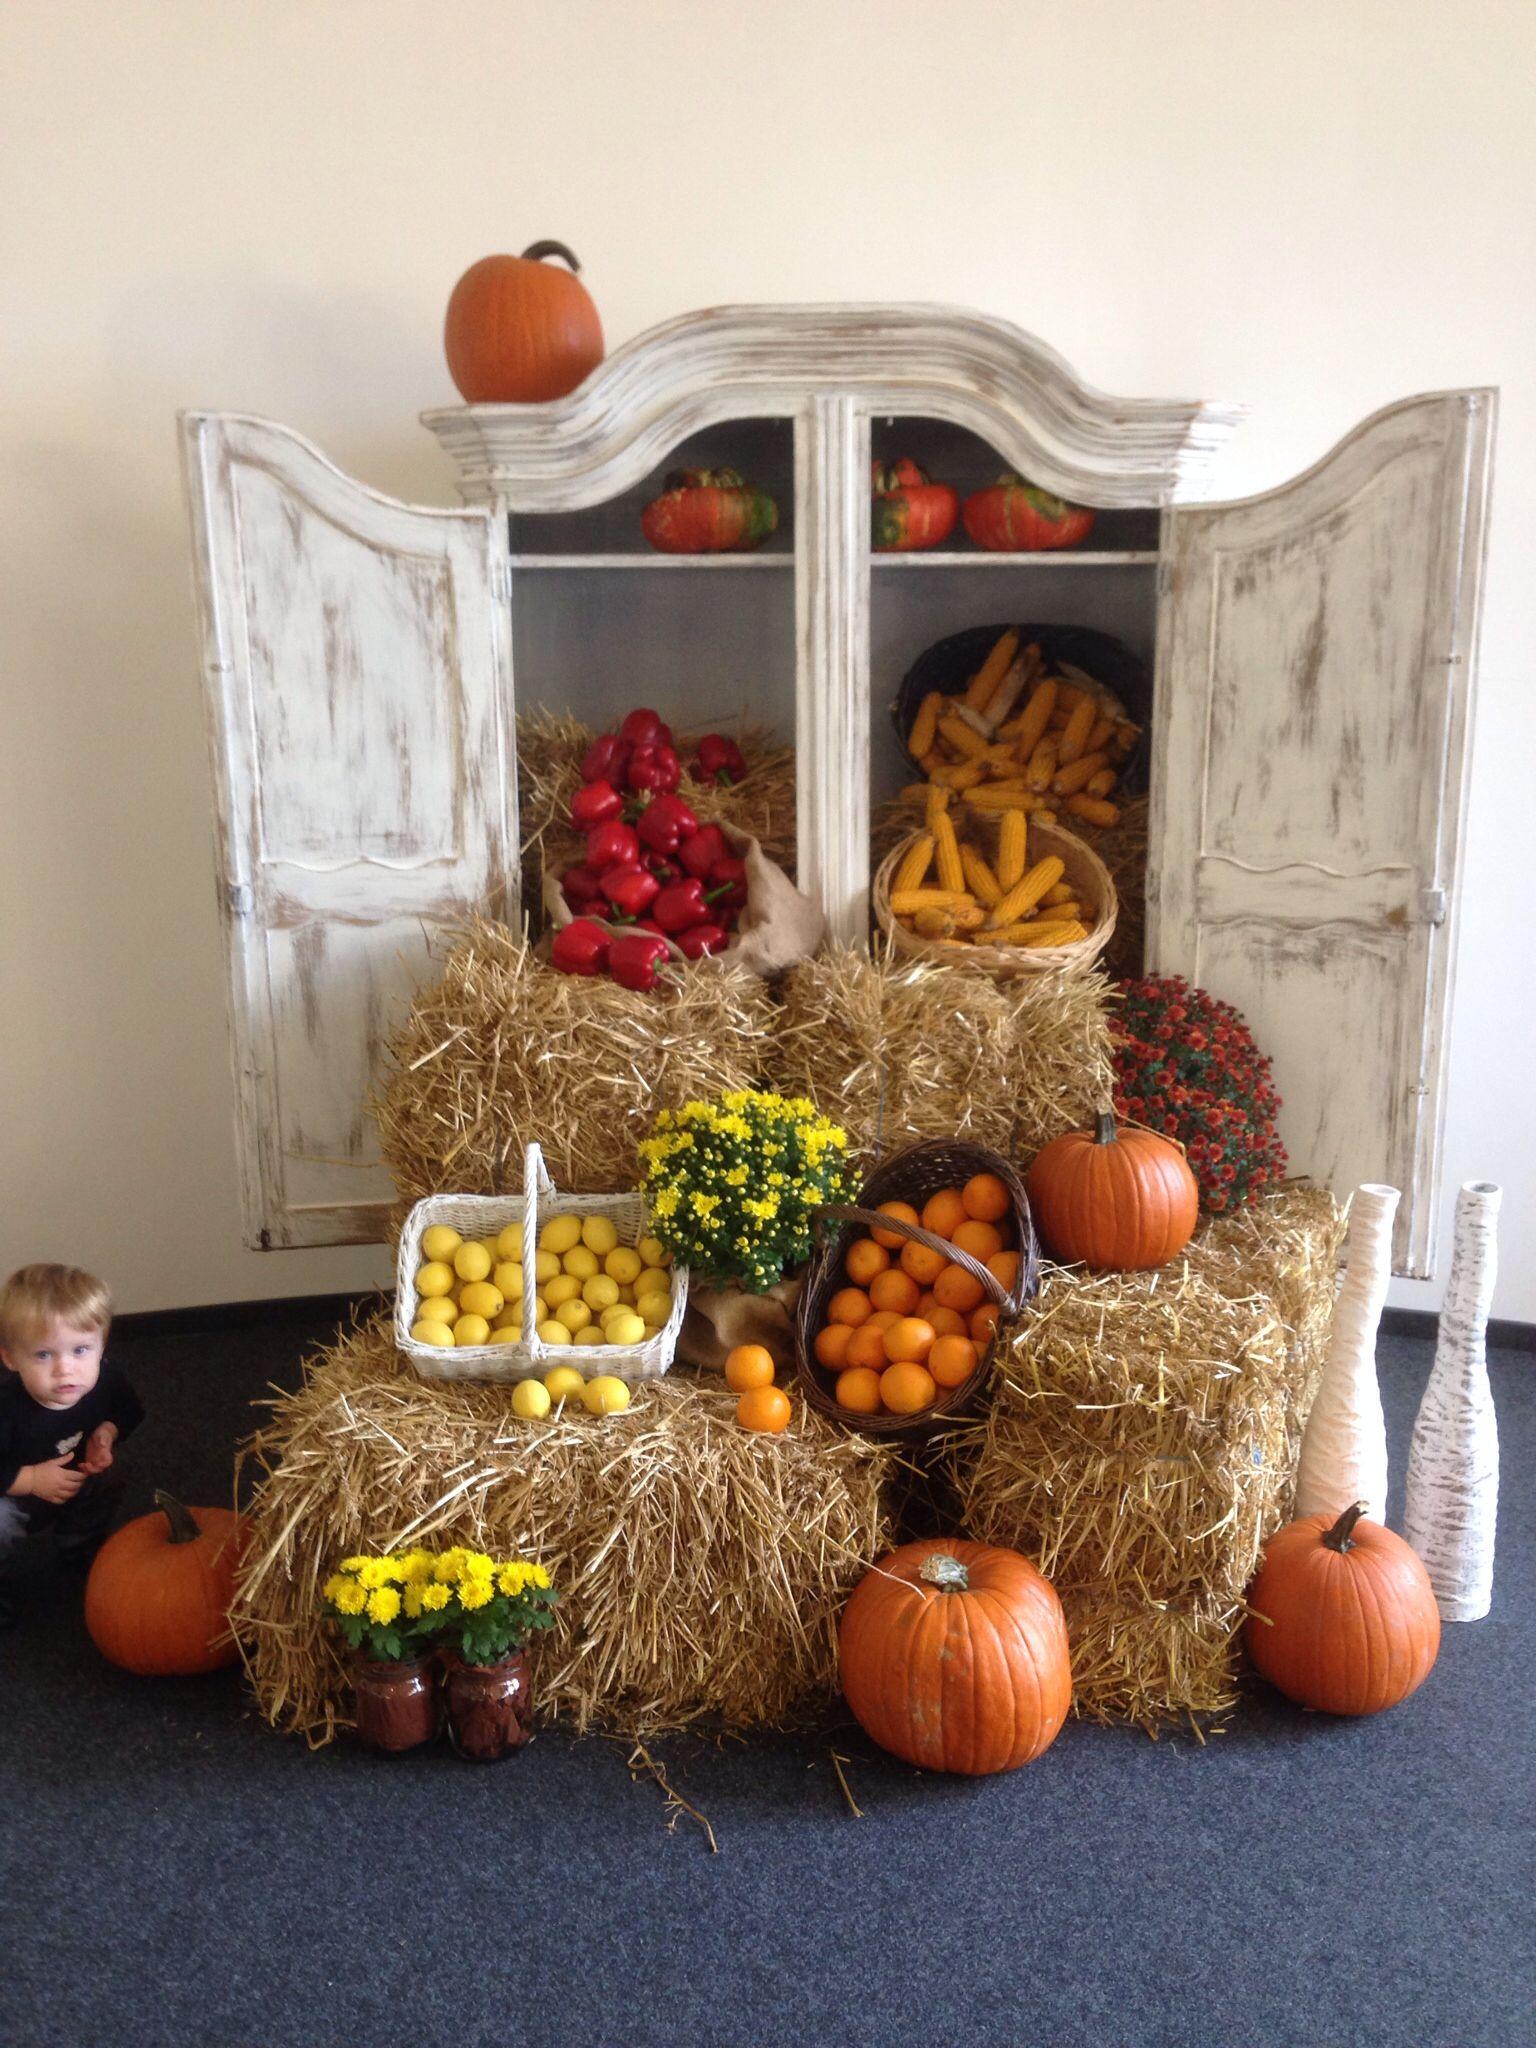 erntedankfest siegburg floristik pinterest erntedankfest siegburg und erntedank. Black Bedroom Furniture Sets. Home Design Ideas